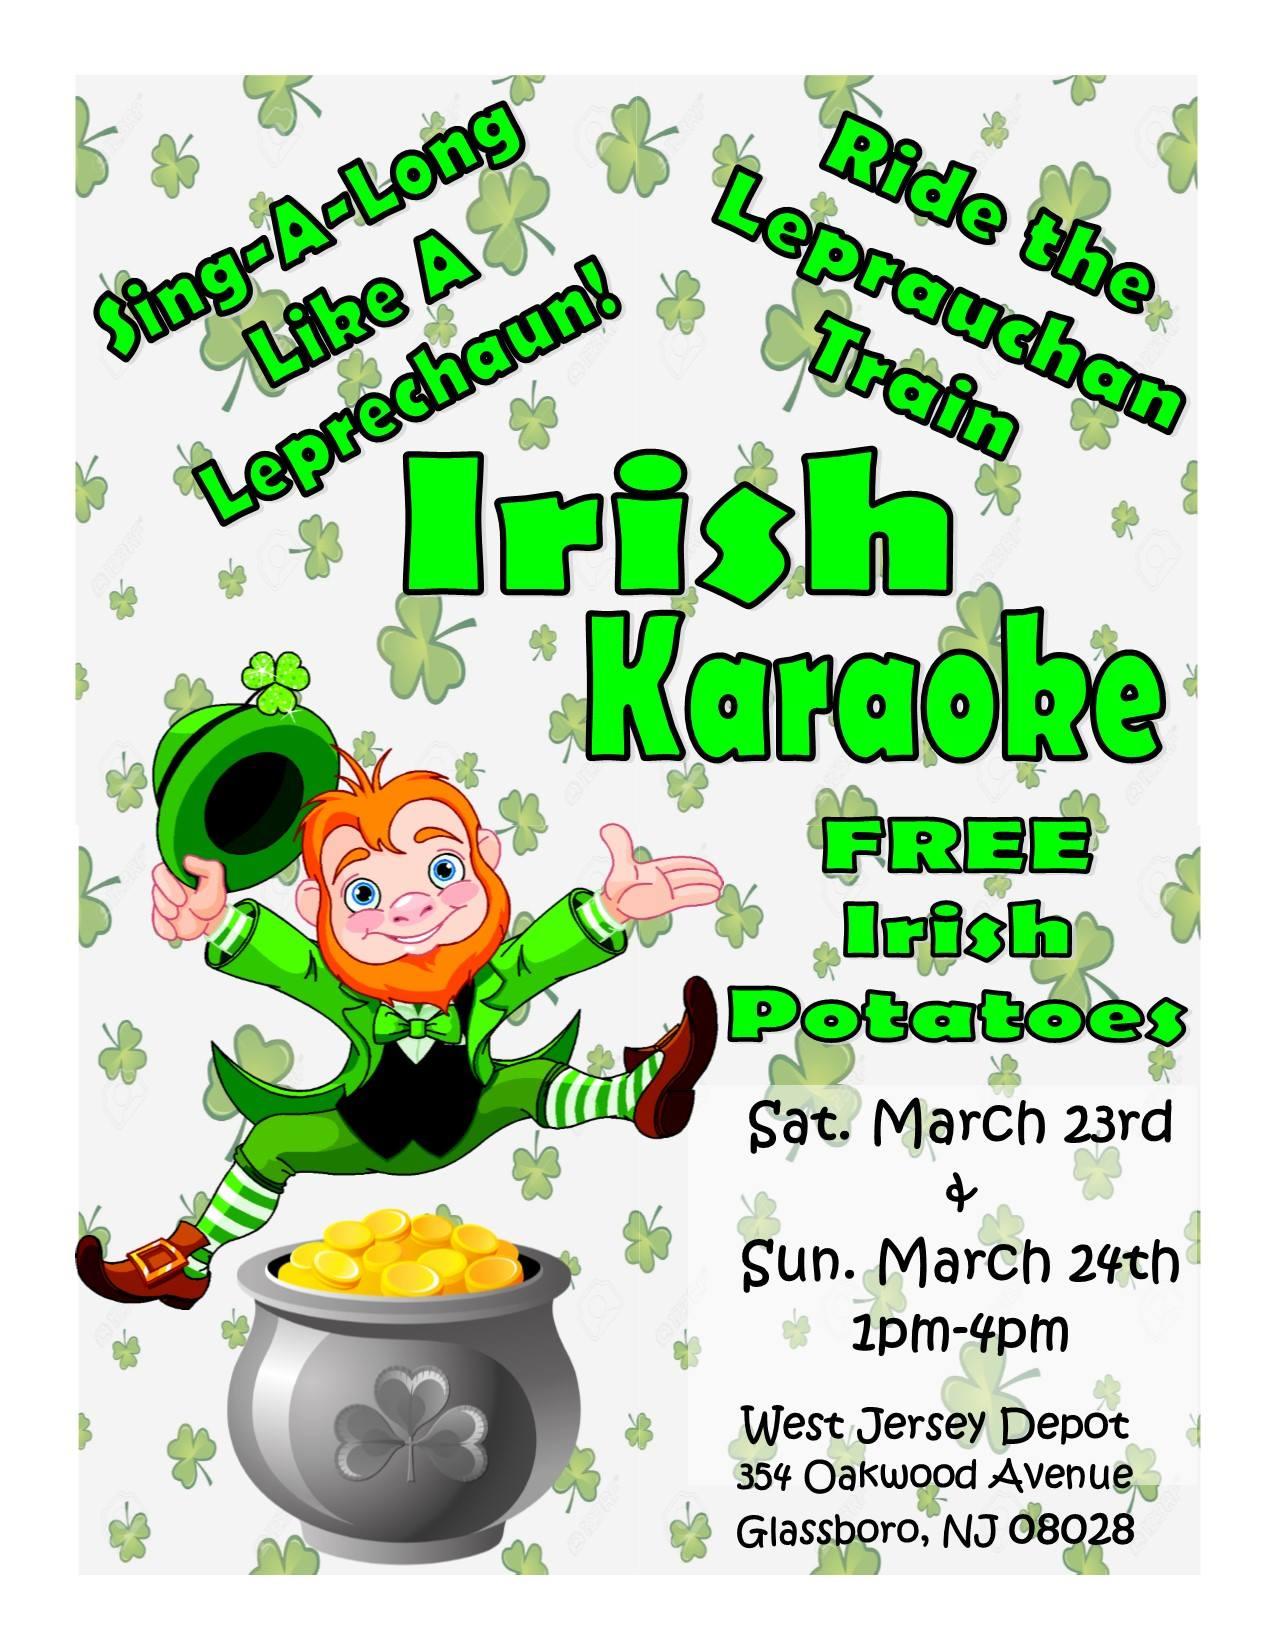 March Open House at the West Jersey Depot-Irish Karaoke!.jpg